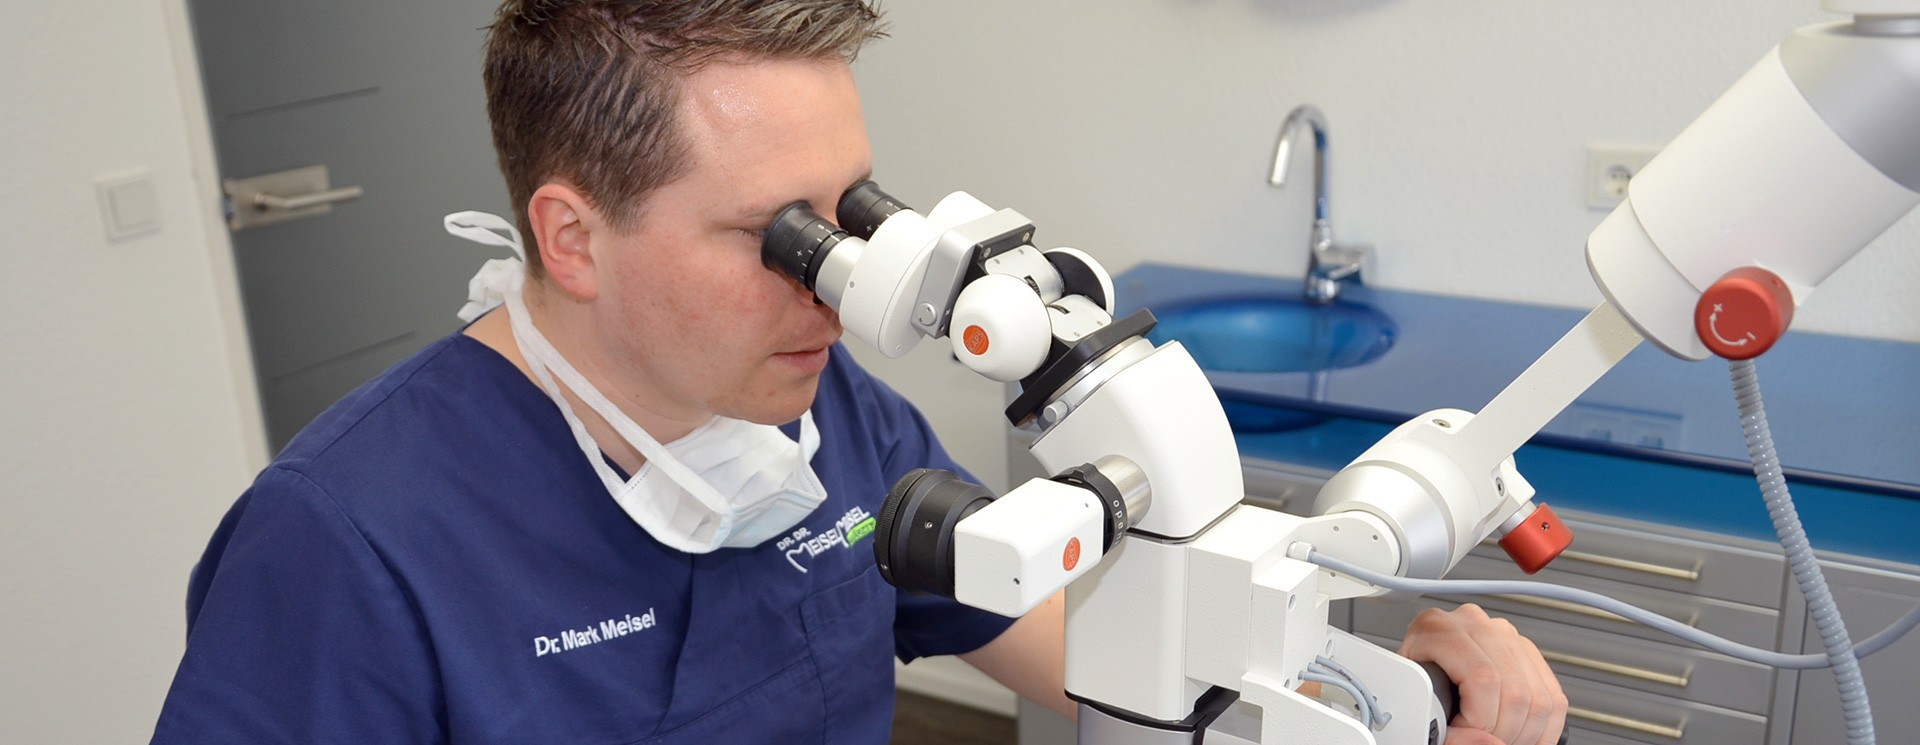 Zahnarztpraxis Dres. Meisel Nürnberg | Mikroskop